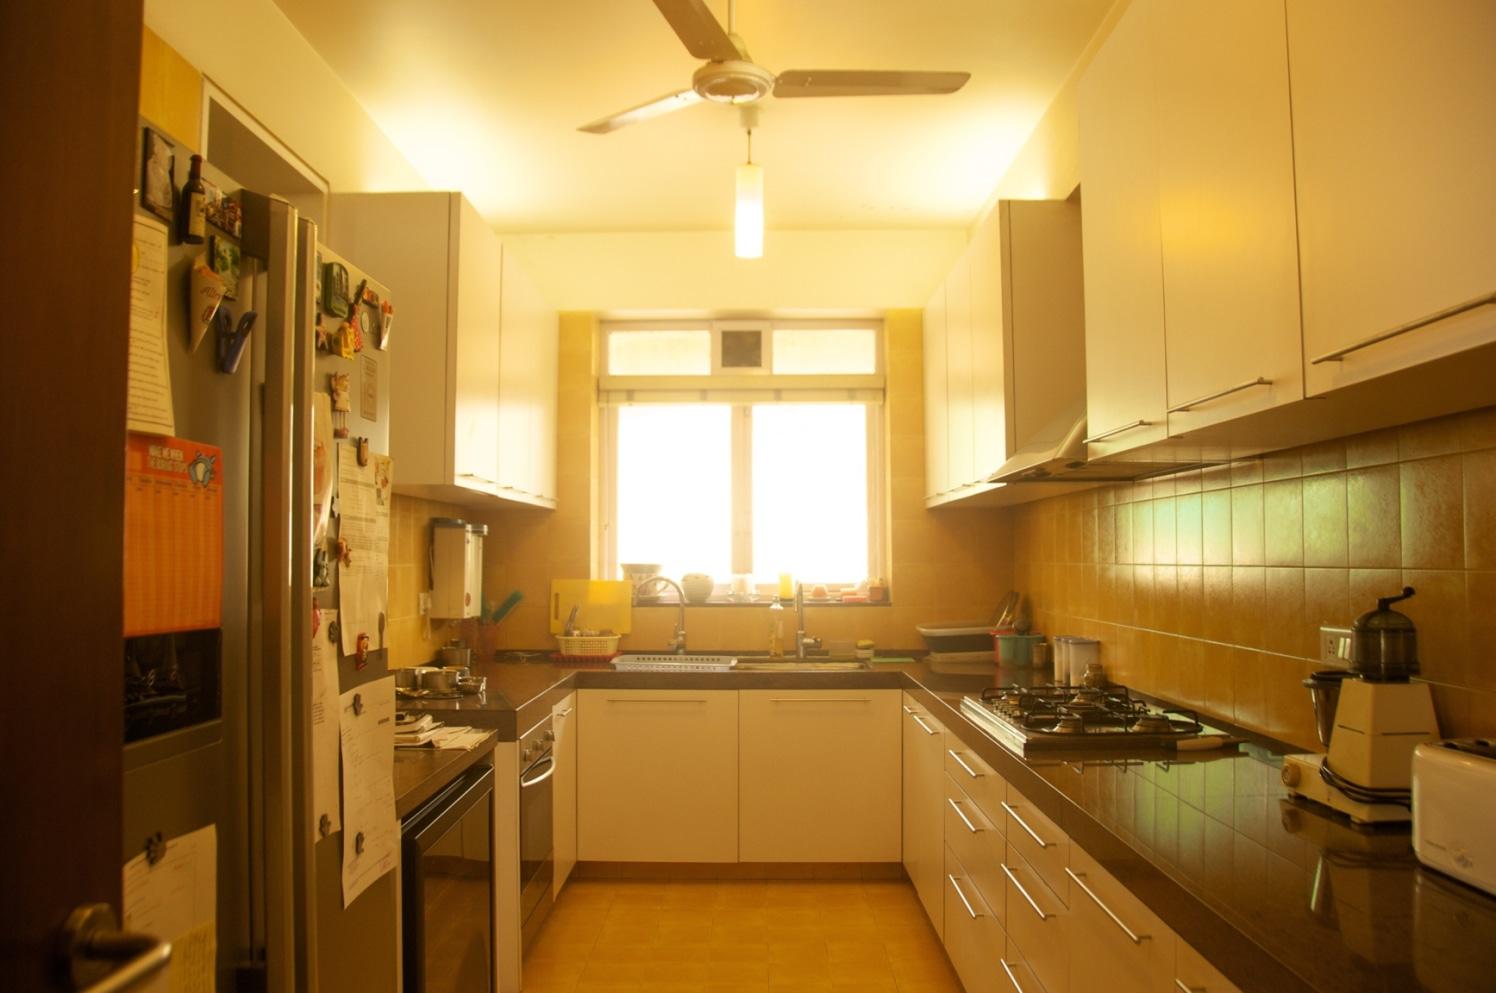 U Shaped Modular Kitchen with White Glossy Cabinets and Black Counter Top by Viraf Laskari  Modular-kitchen Modern | Interior Design Photos & Ideas